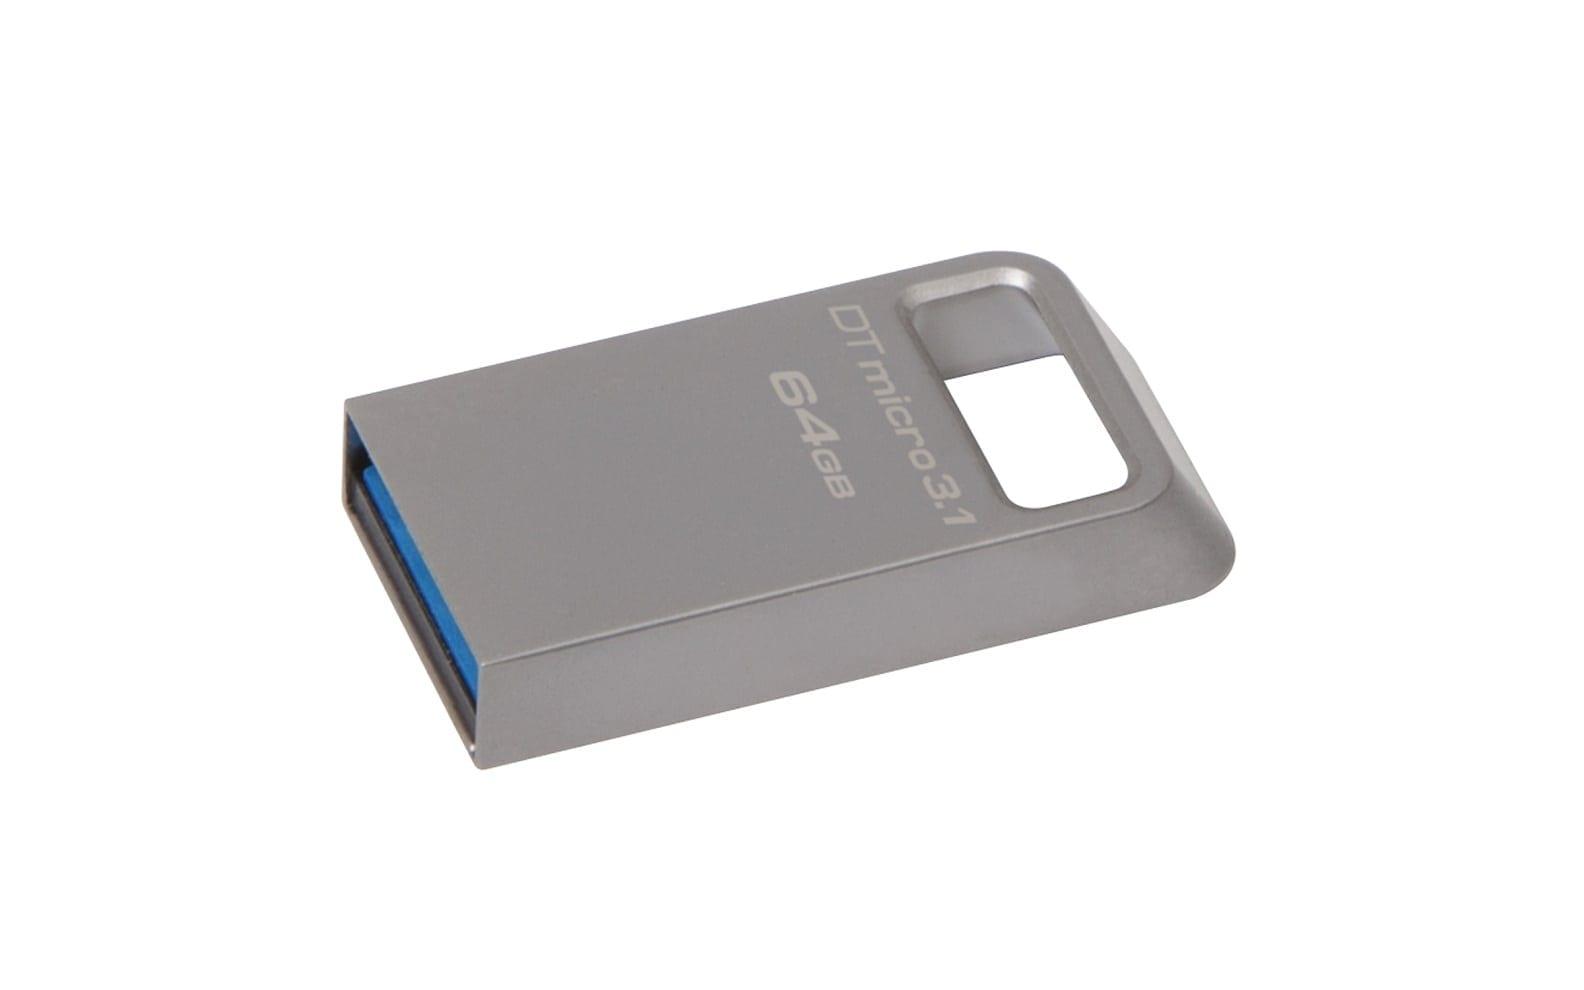 DataTraveler Micro 3_DTMC3_64GB_hr_26_05_2015 13_52